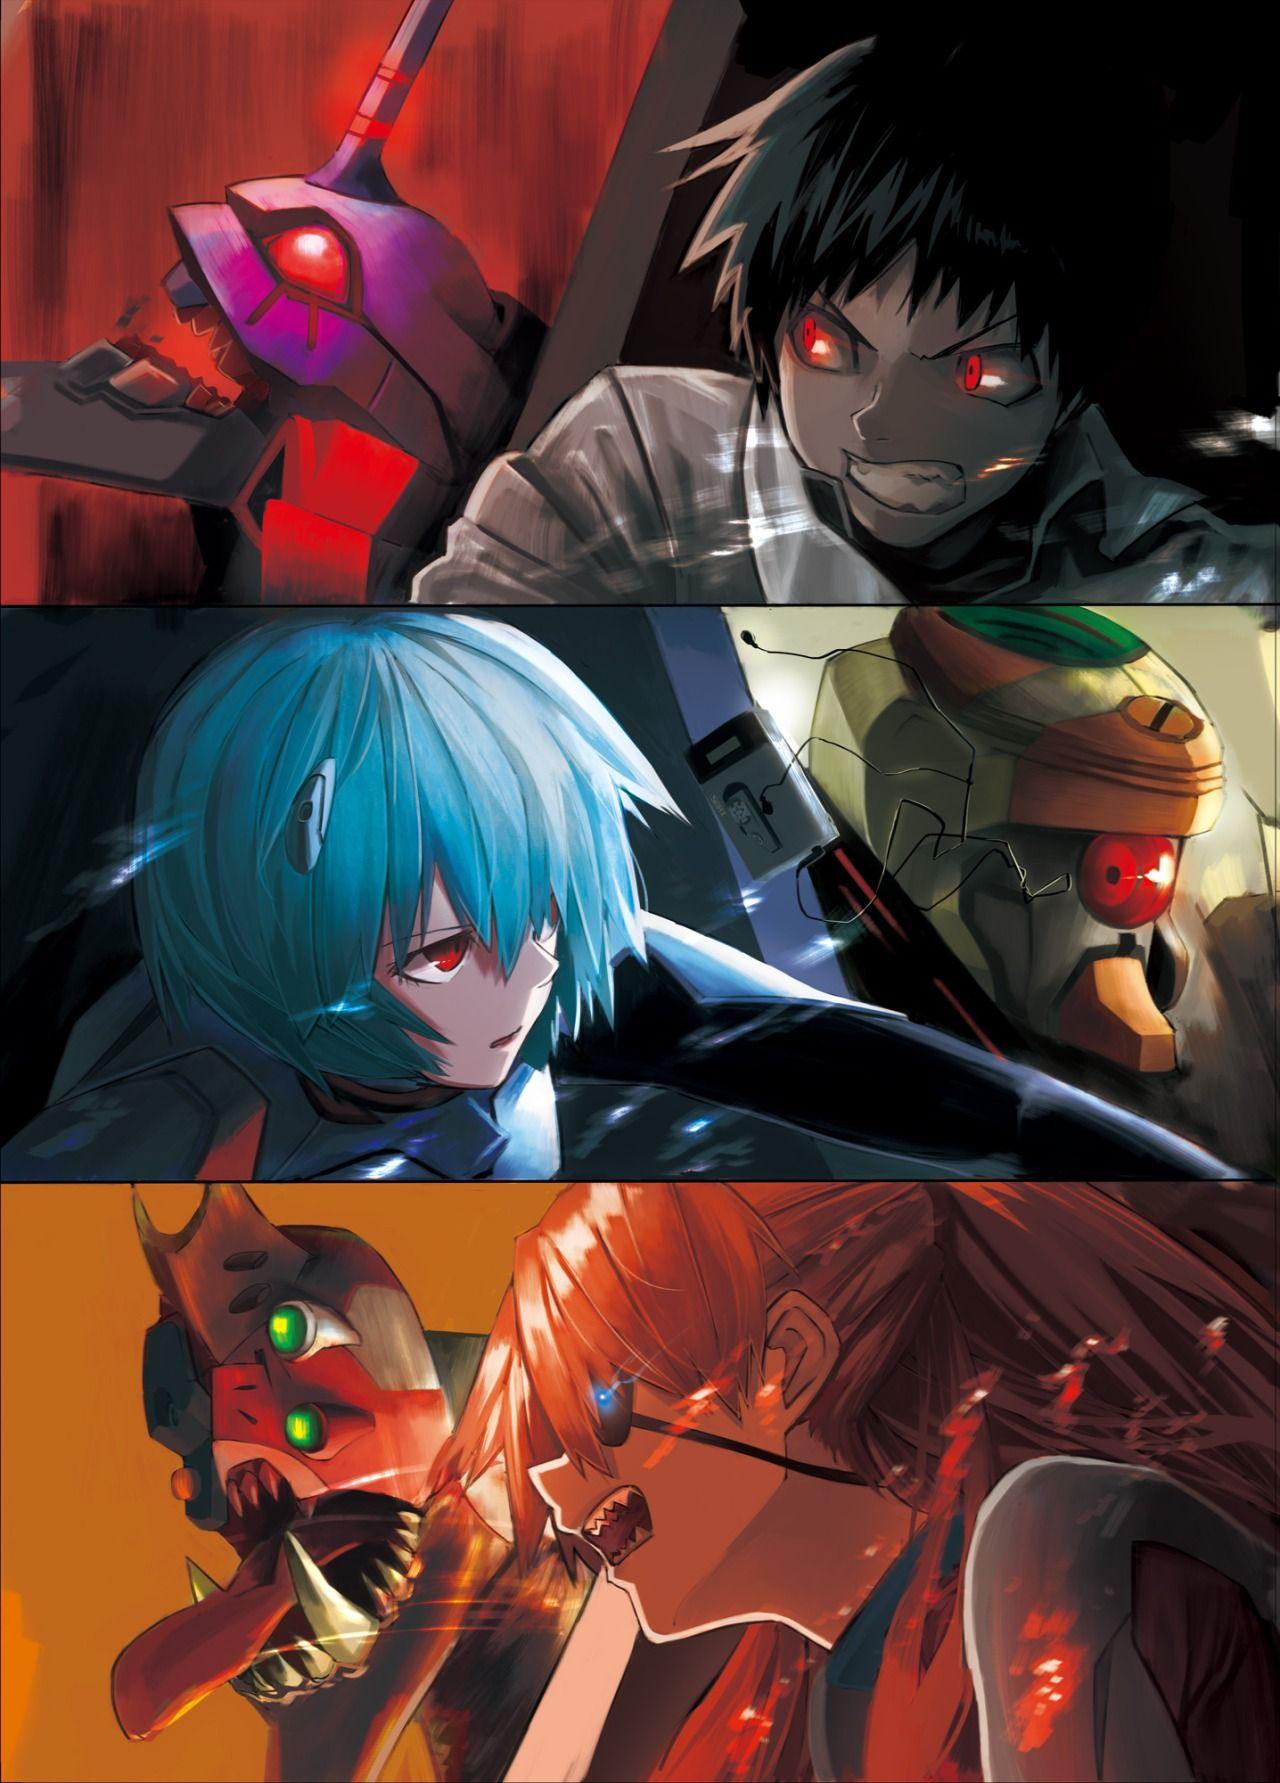 Neon Genesis Evangelion 3.33